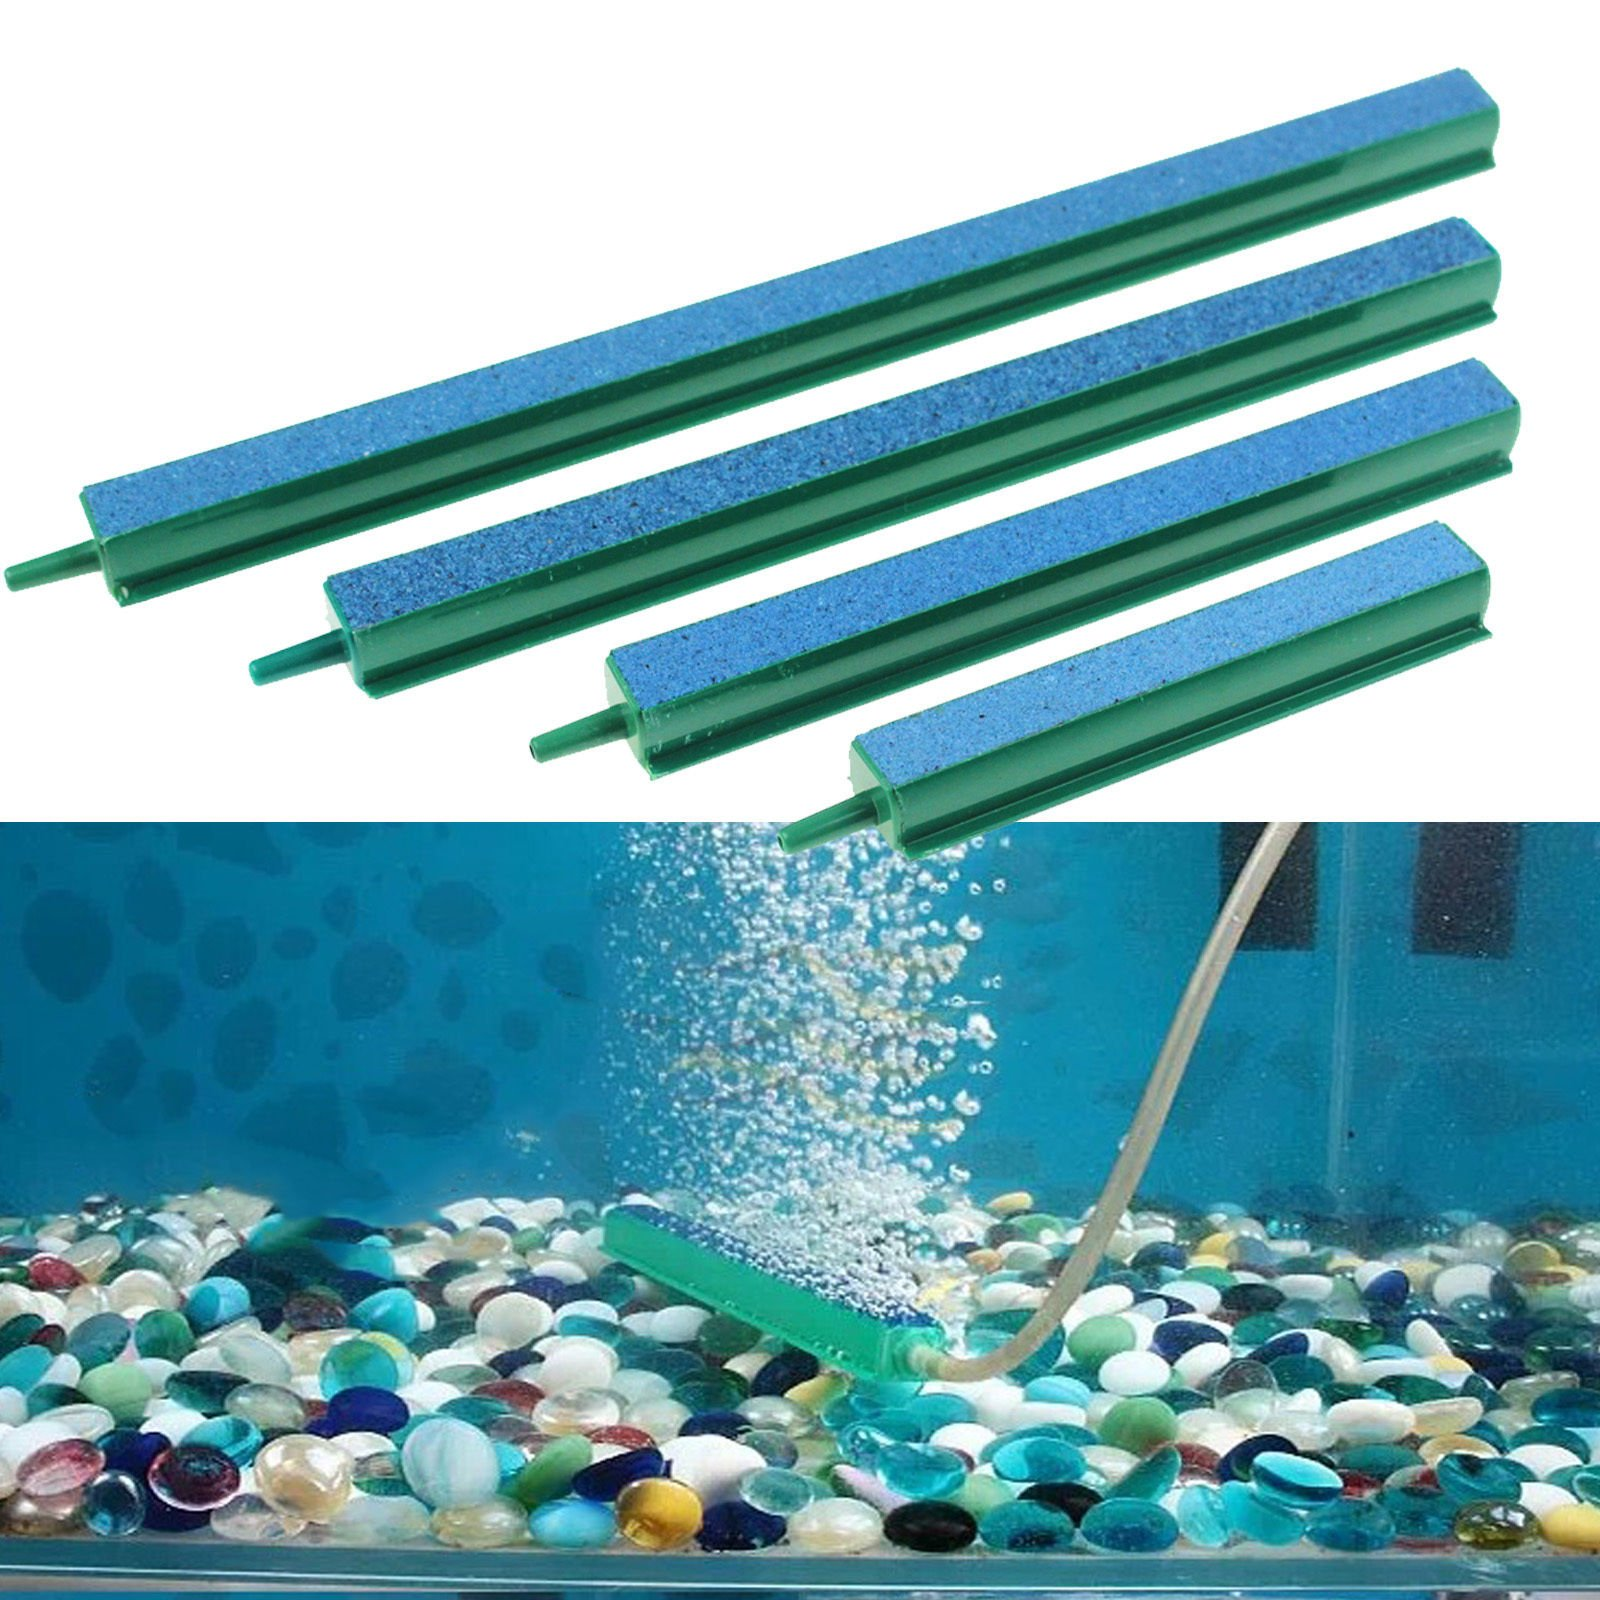 "Newly Fish Tank Aquarium Decor Air Stone Bubble Wall Tube 4"" 6"" 8"" 10"" Durable"